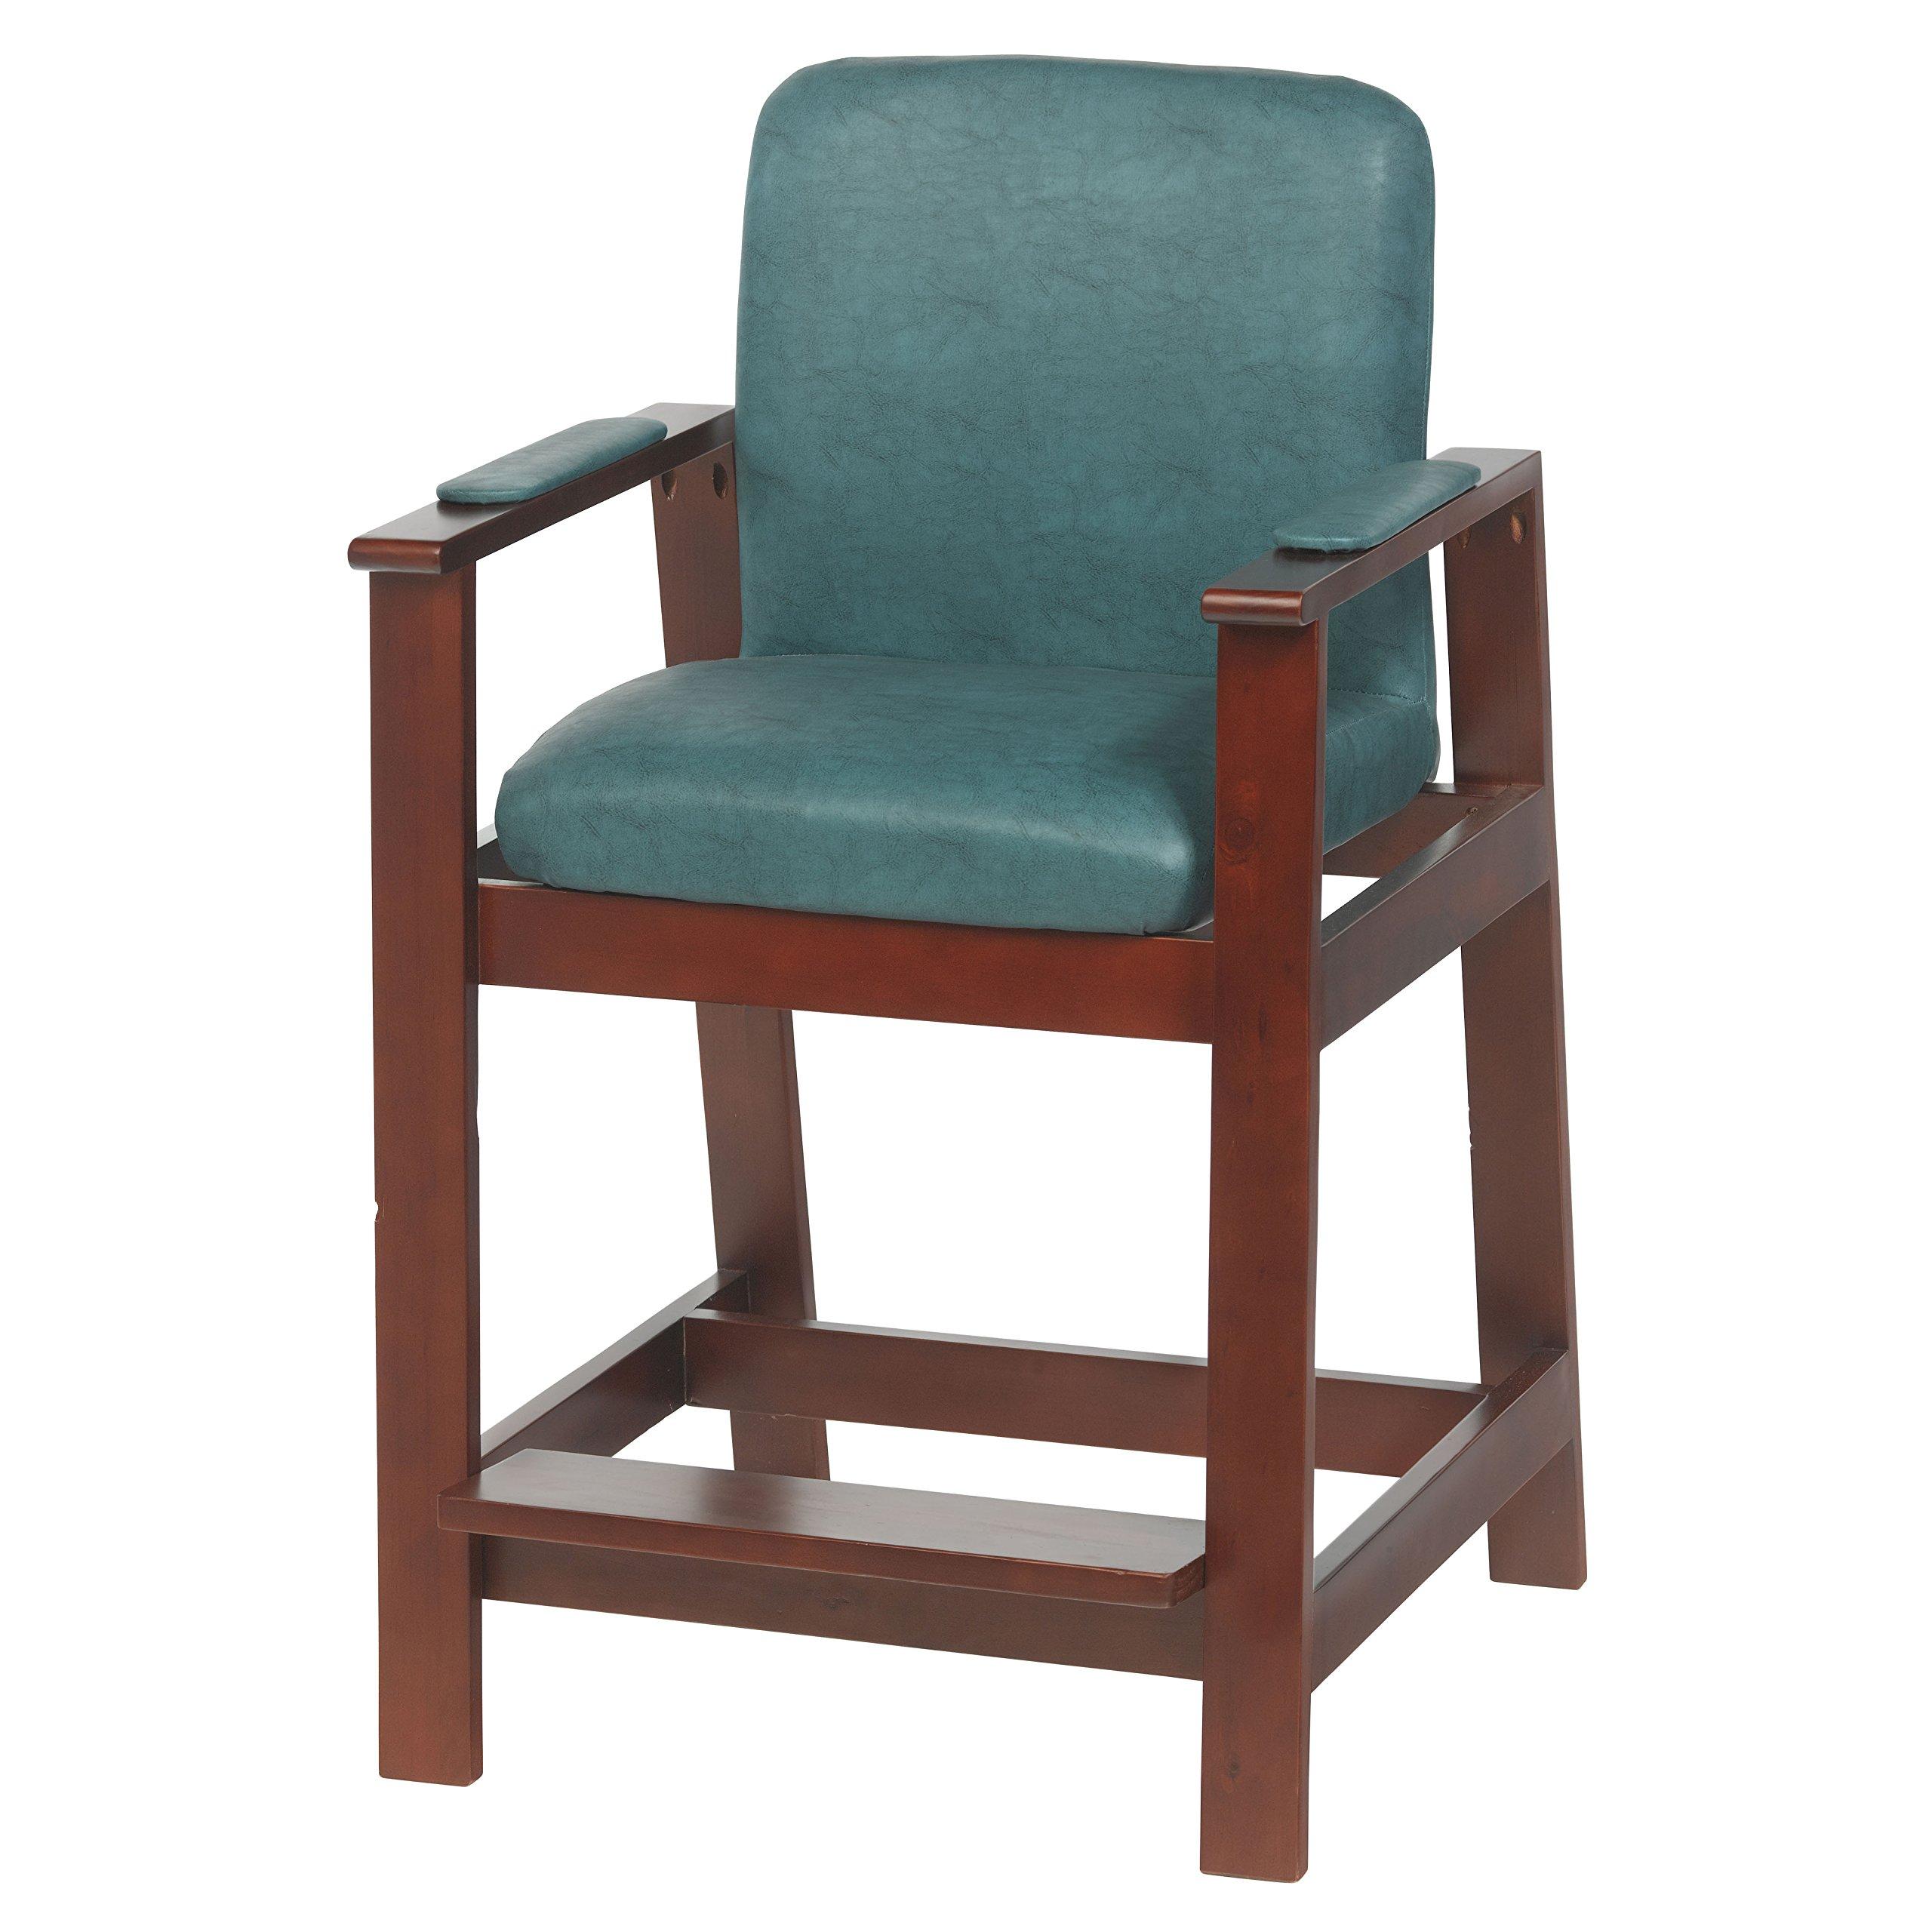 Drive Medical 1710 Wood Hip High Chair, Cherry